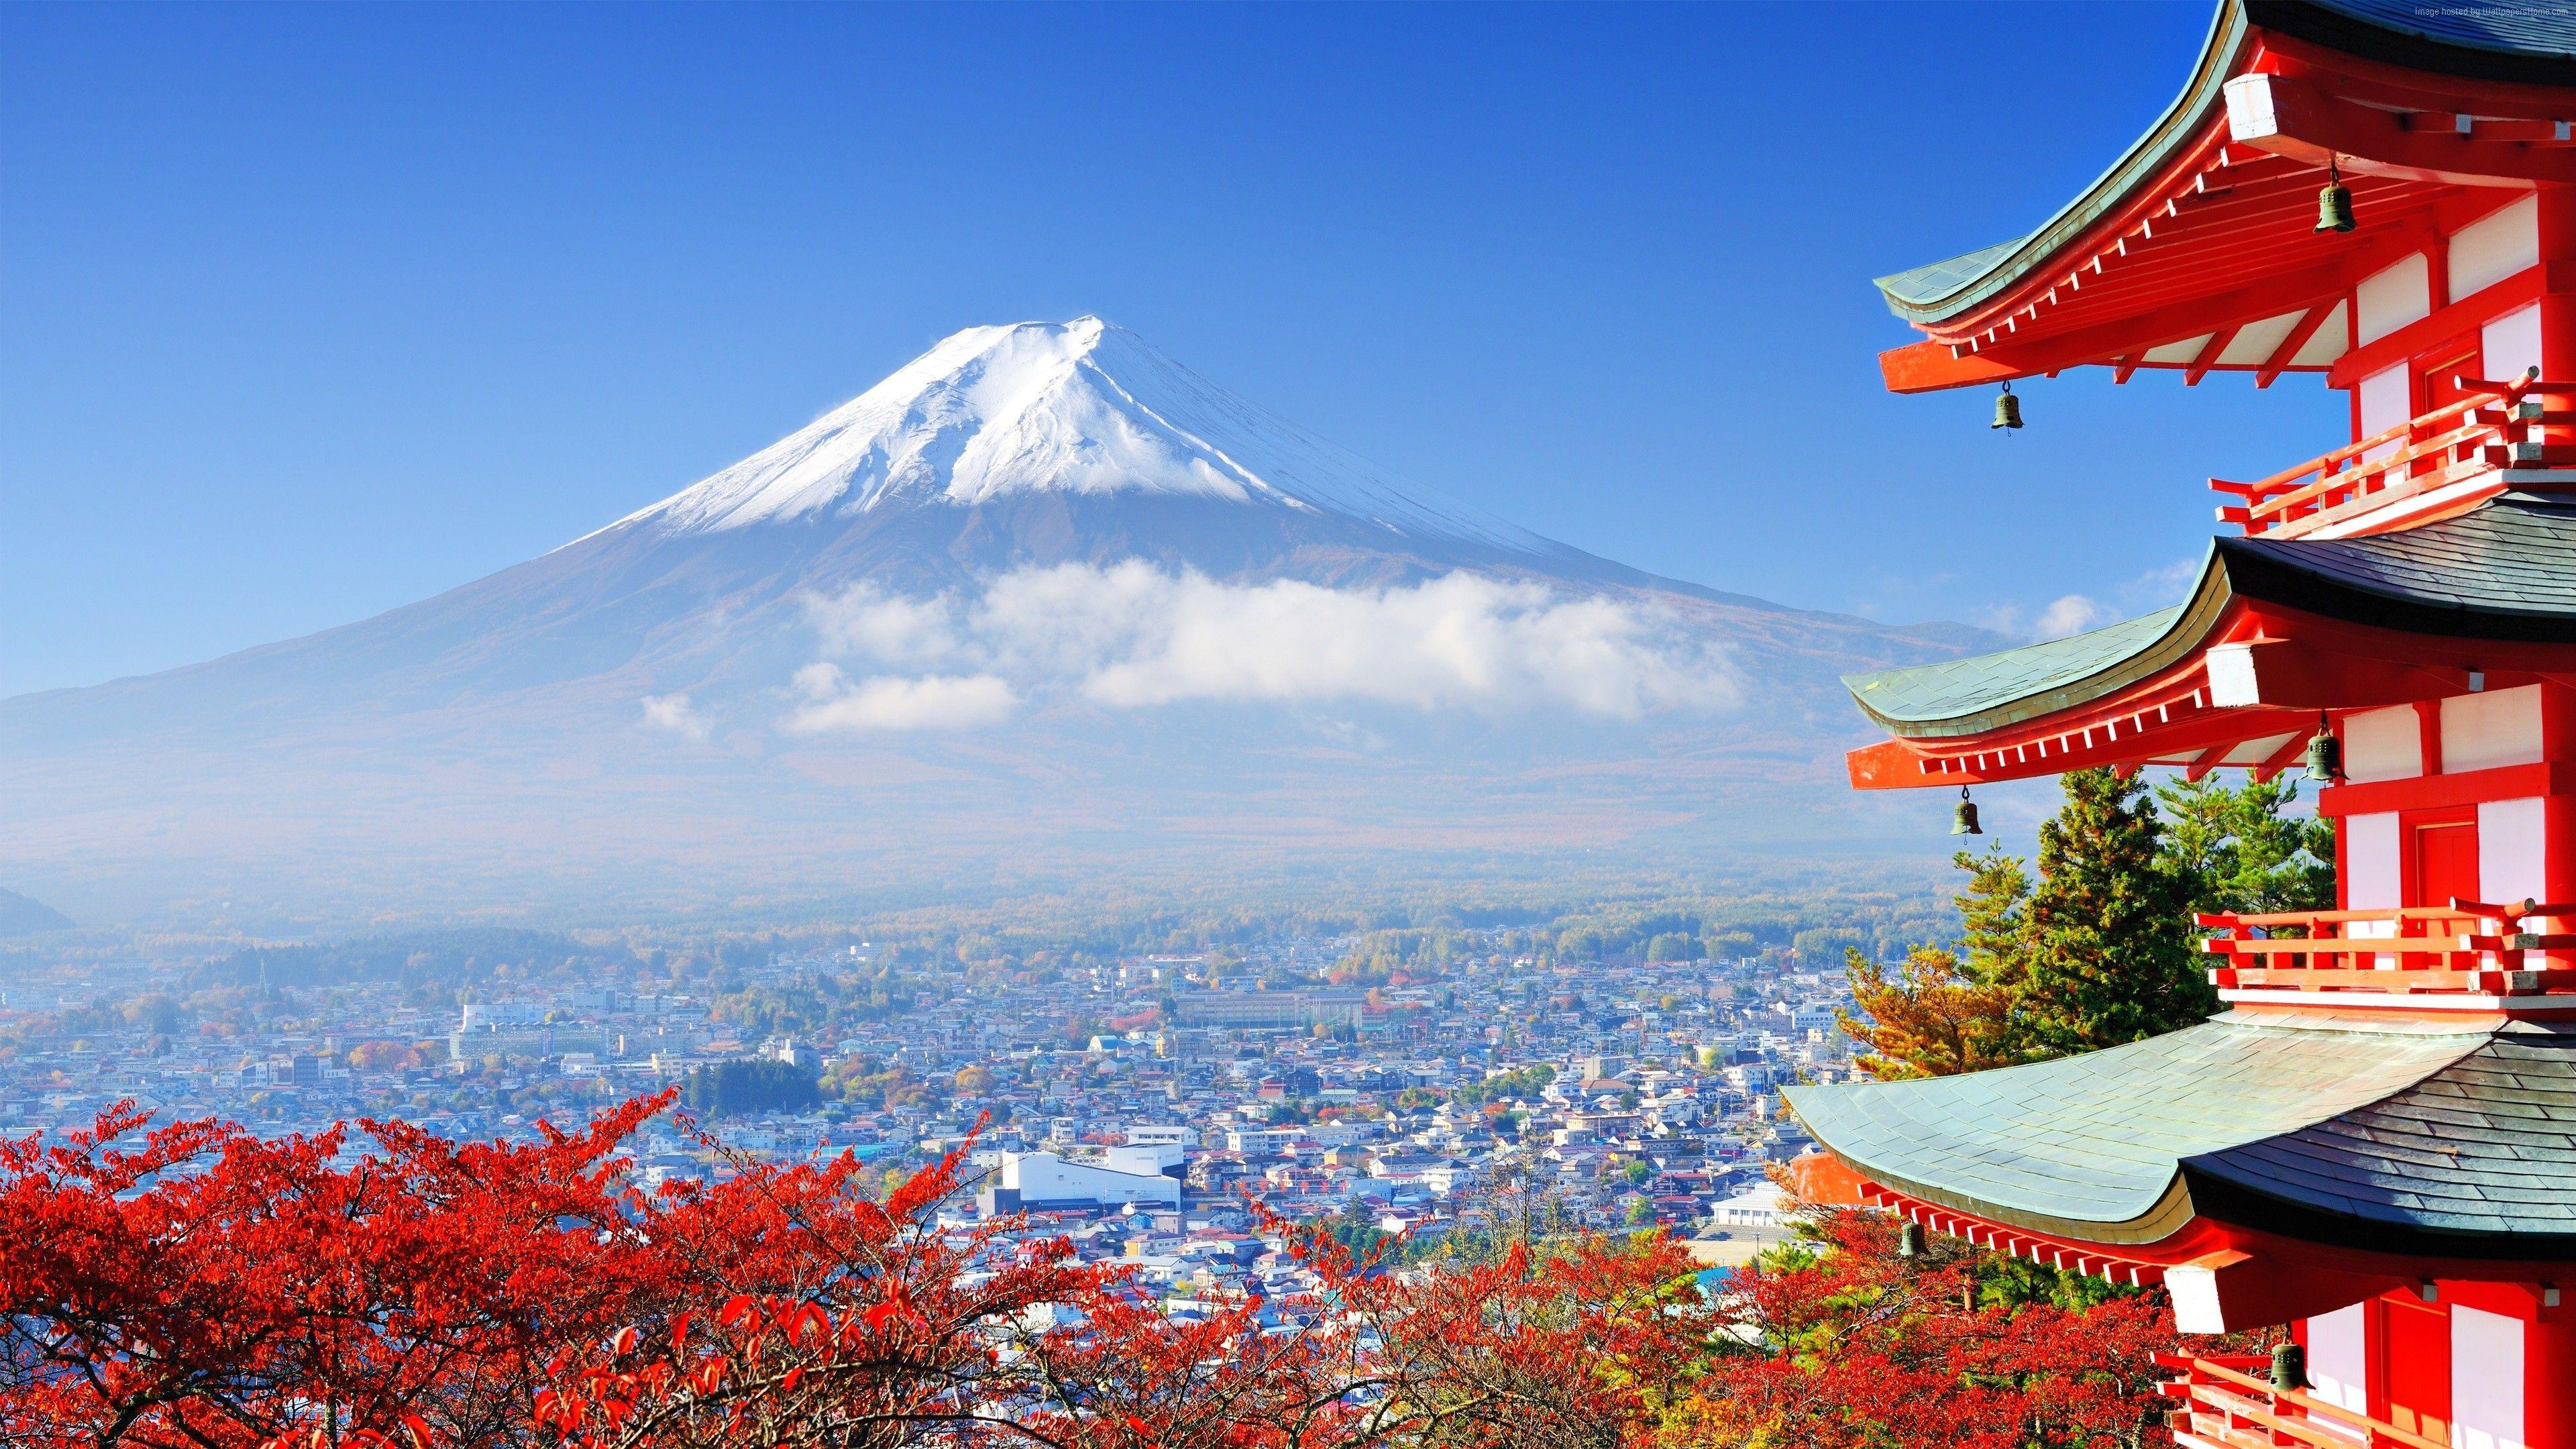 Japan 3840x2160 Wallpapers Top Free Japan 3840x2160 Backgrounds Wallpaperaccess